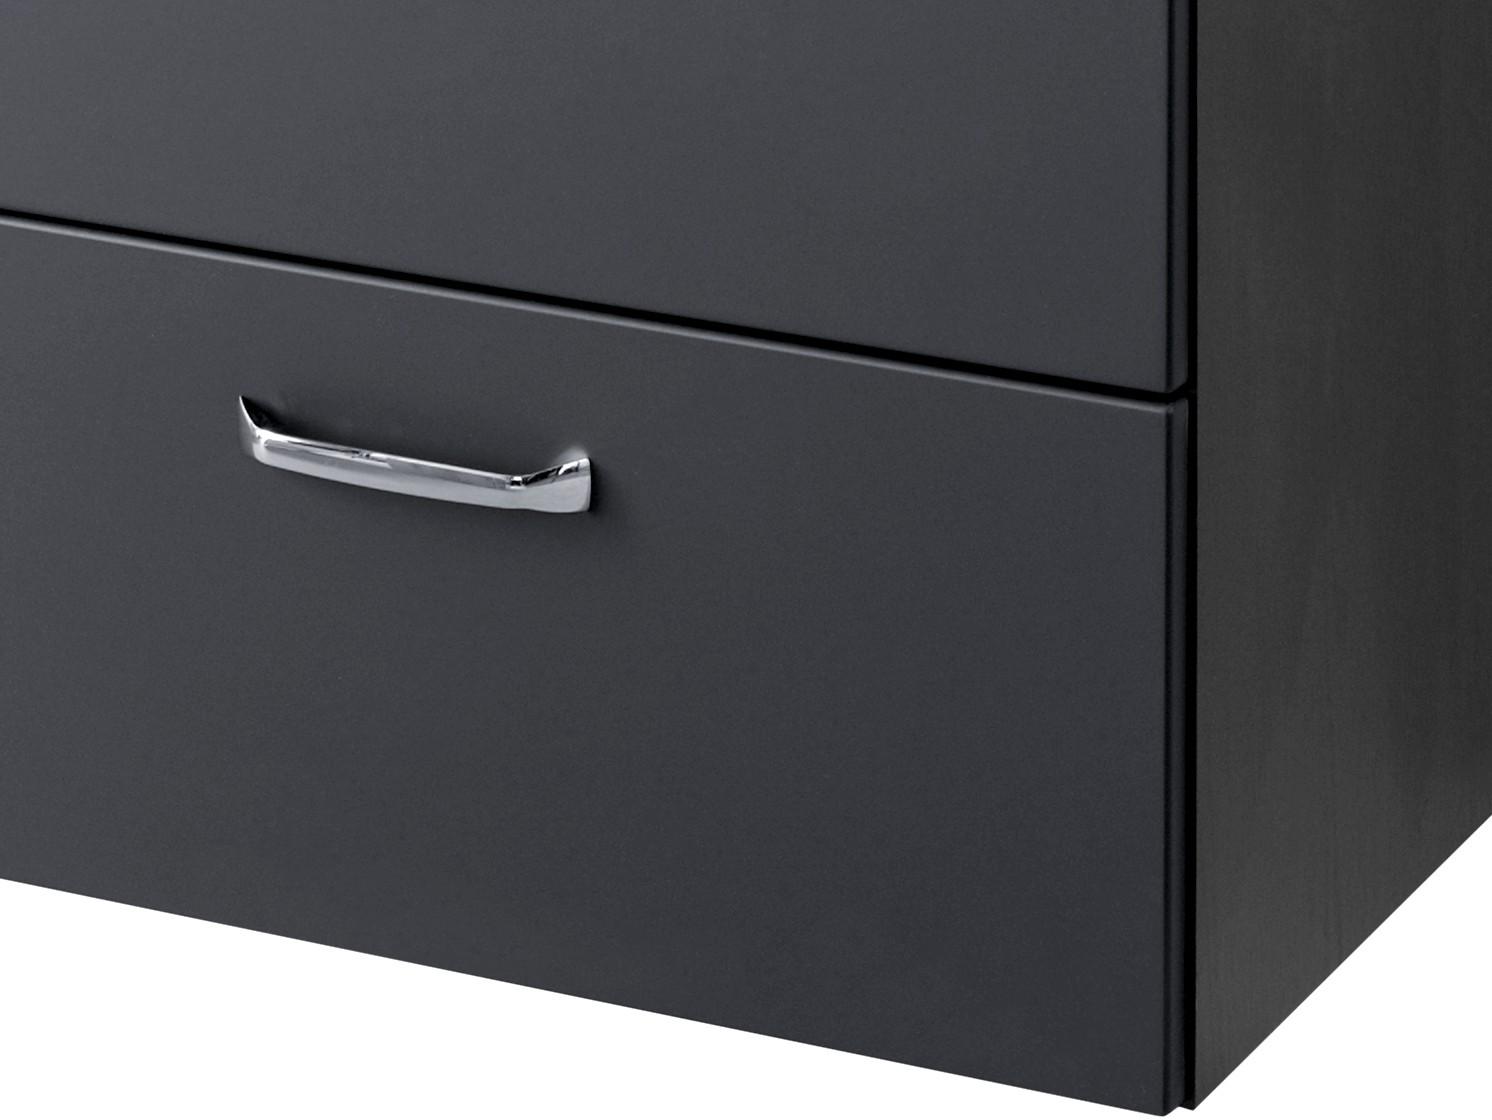 bad waschbeckenunterschrank fontana 1 klappe 1 auszug 60 cm breit anthrazit bad fontana. Black Bedroom Furniture Sets. Home Design Ideas